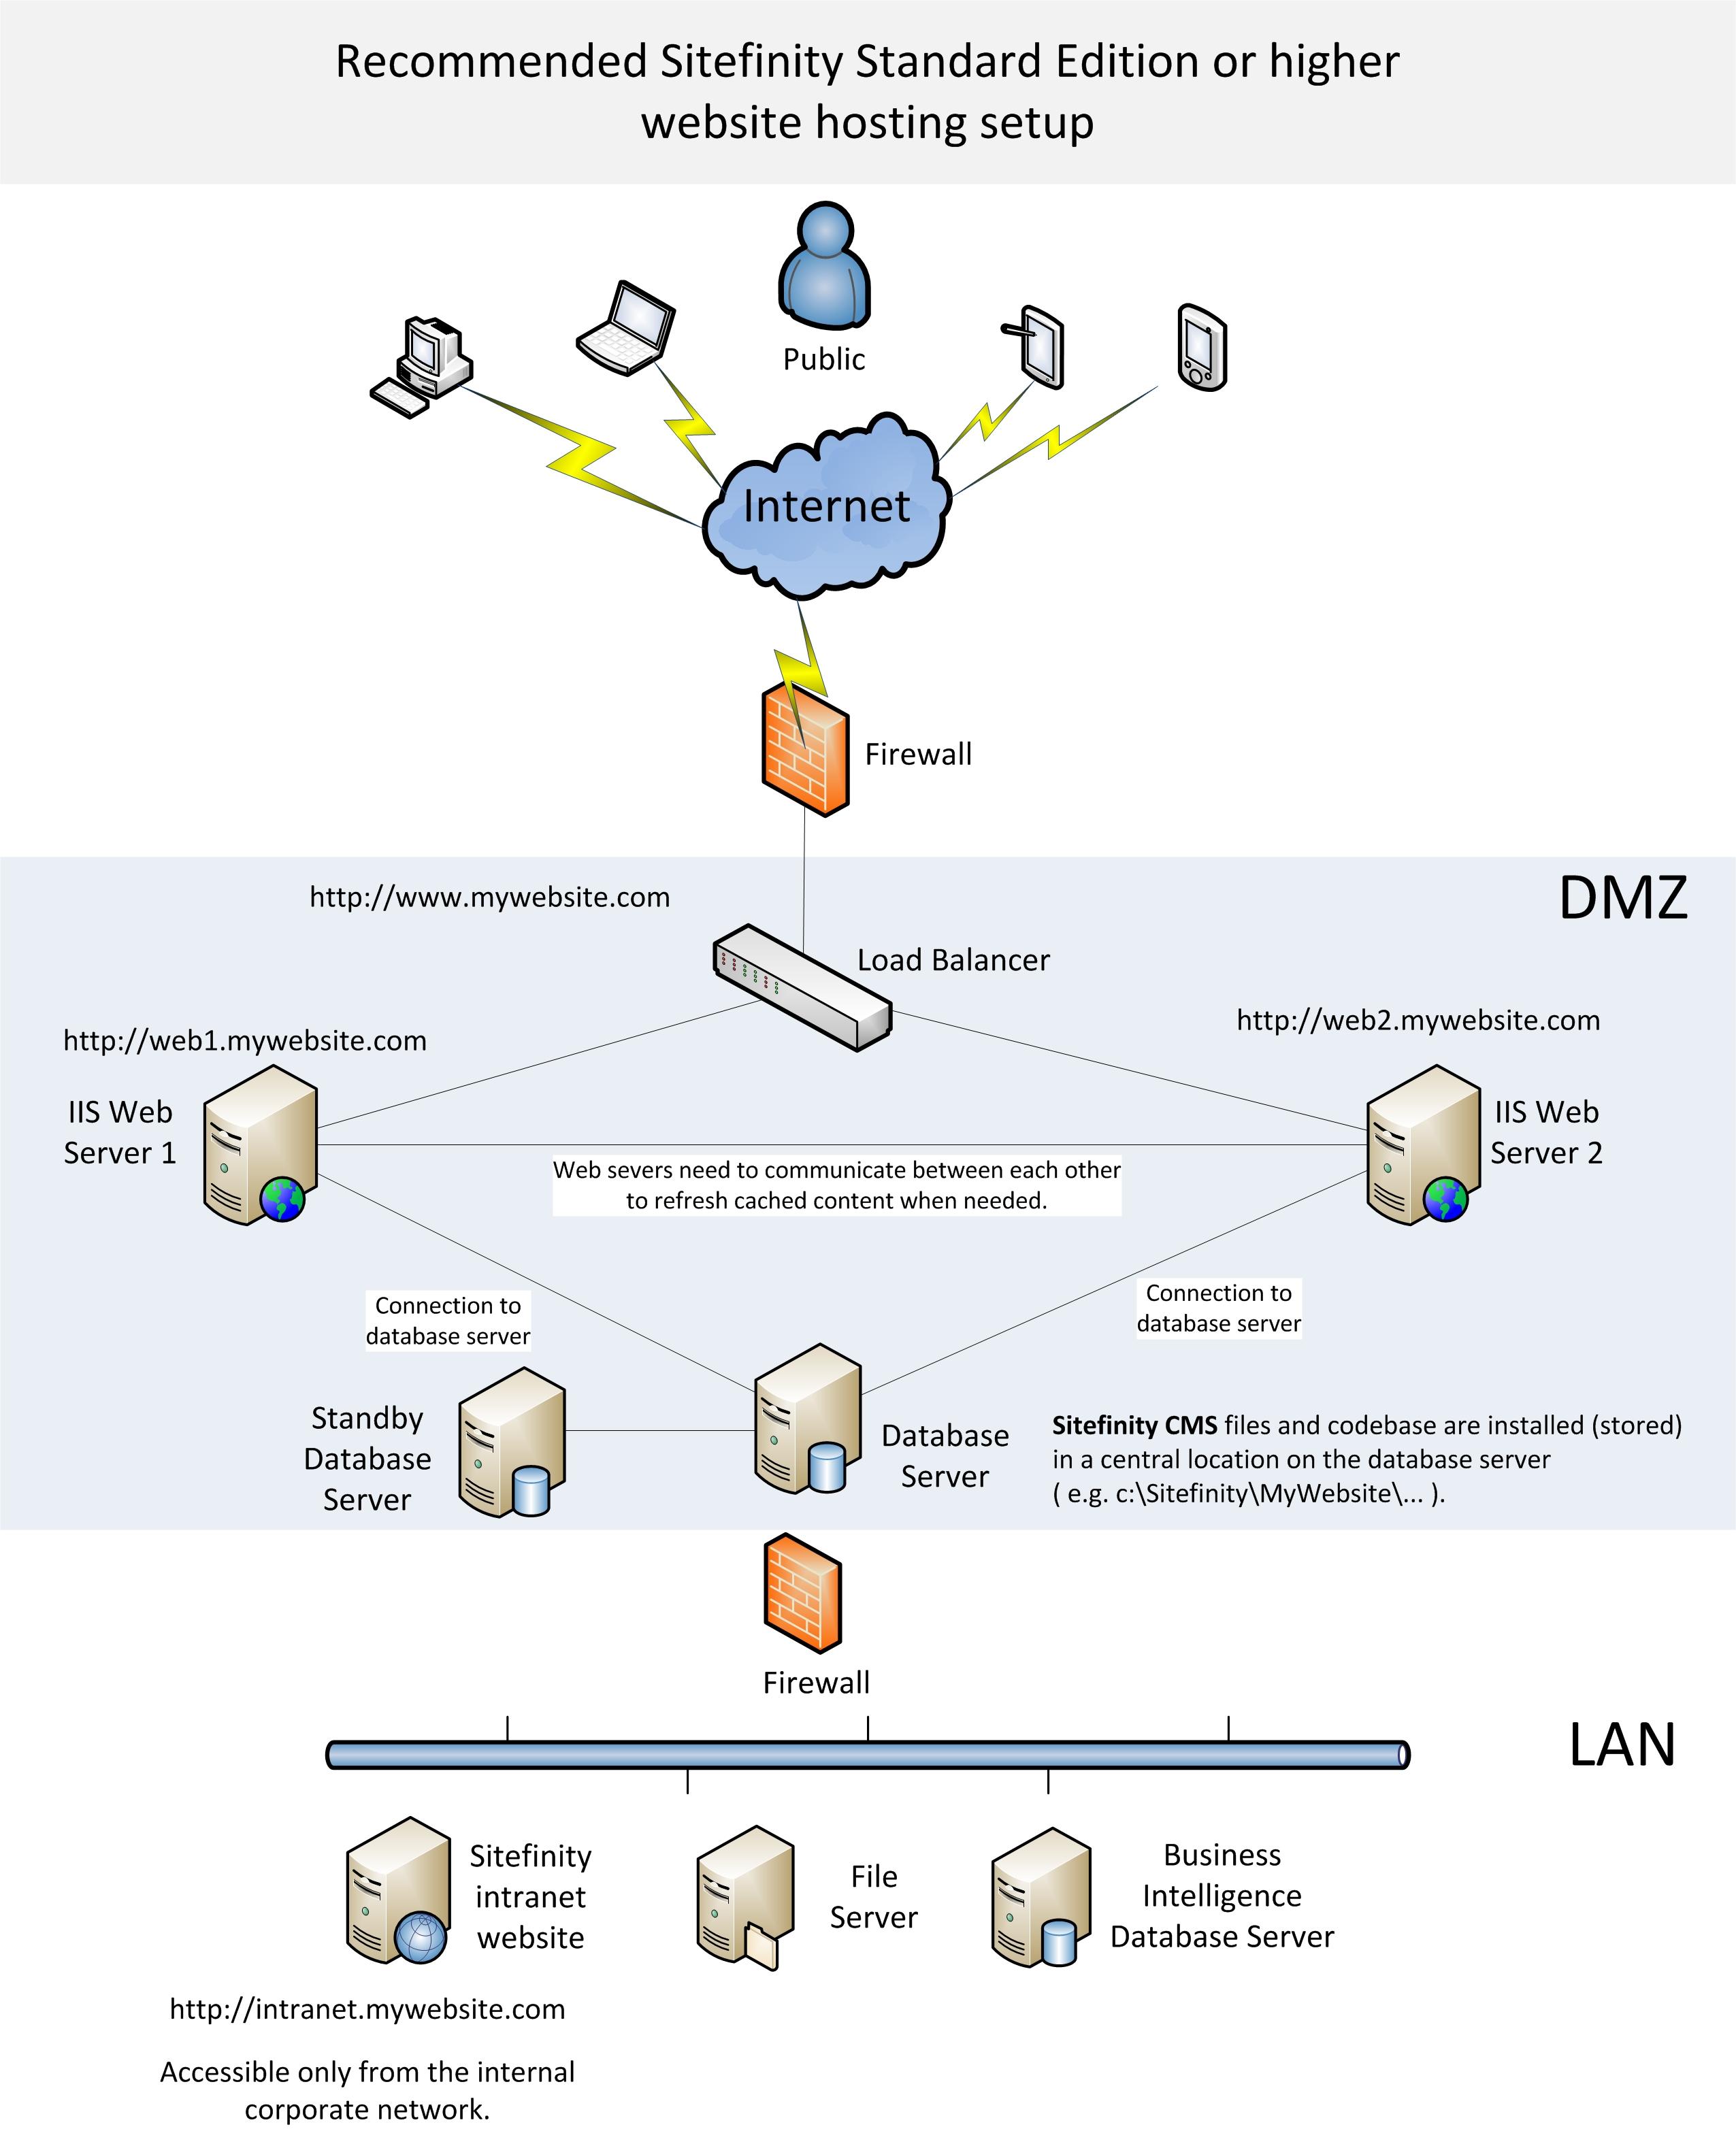 Web Server Dmz Network Diagram Intranet The With Sitefinity Standard Hosting Setup 2551x3129